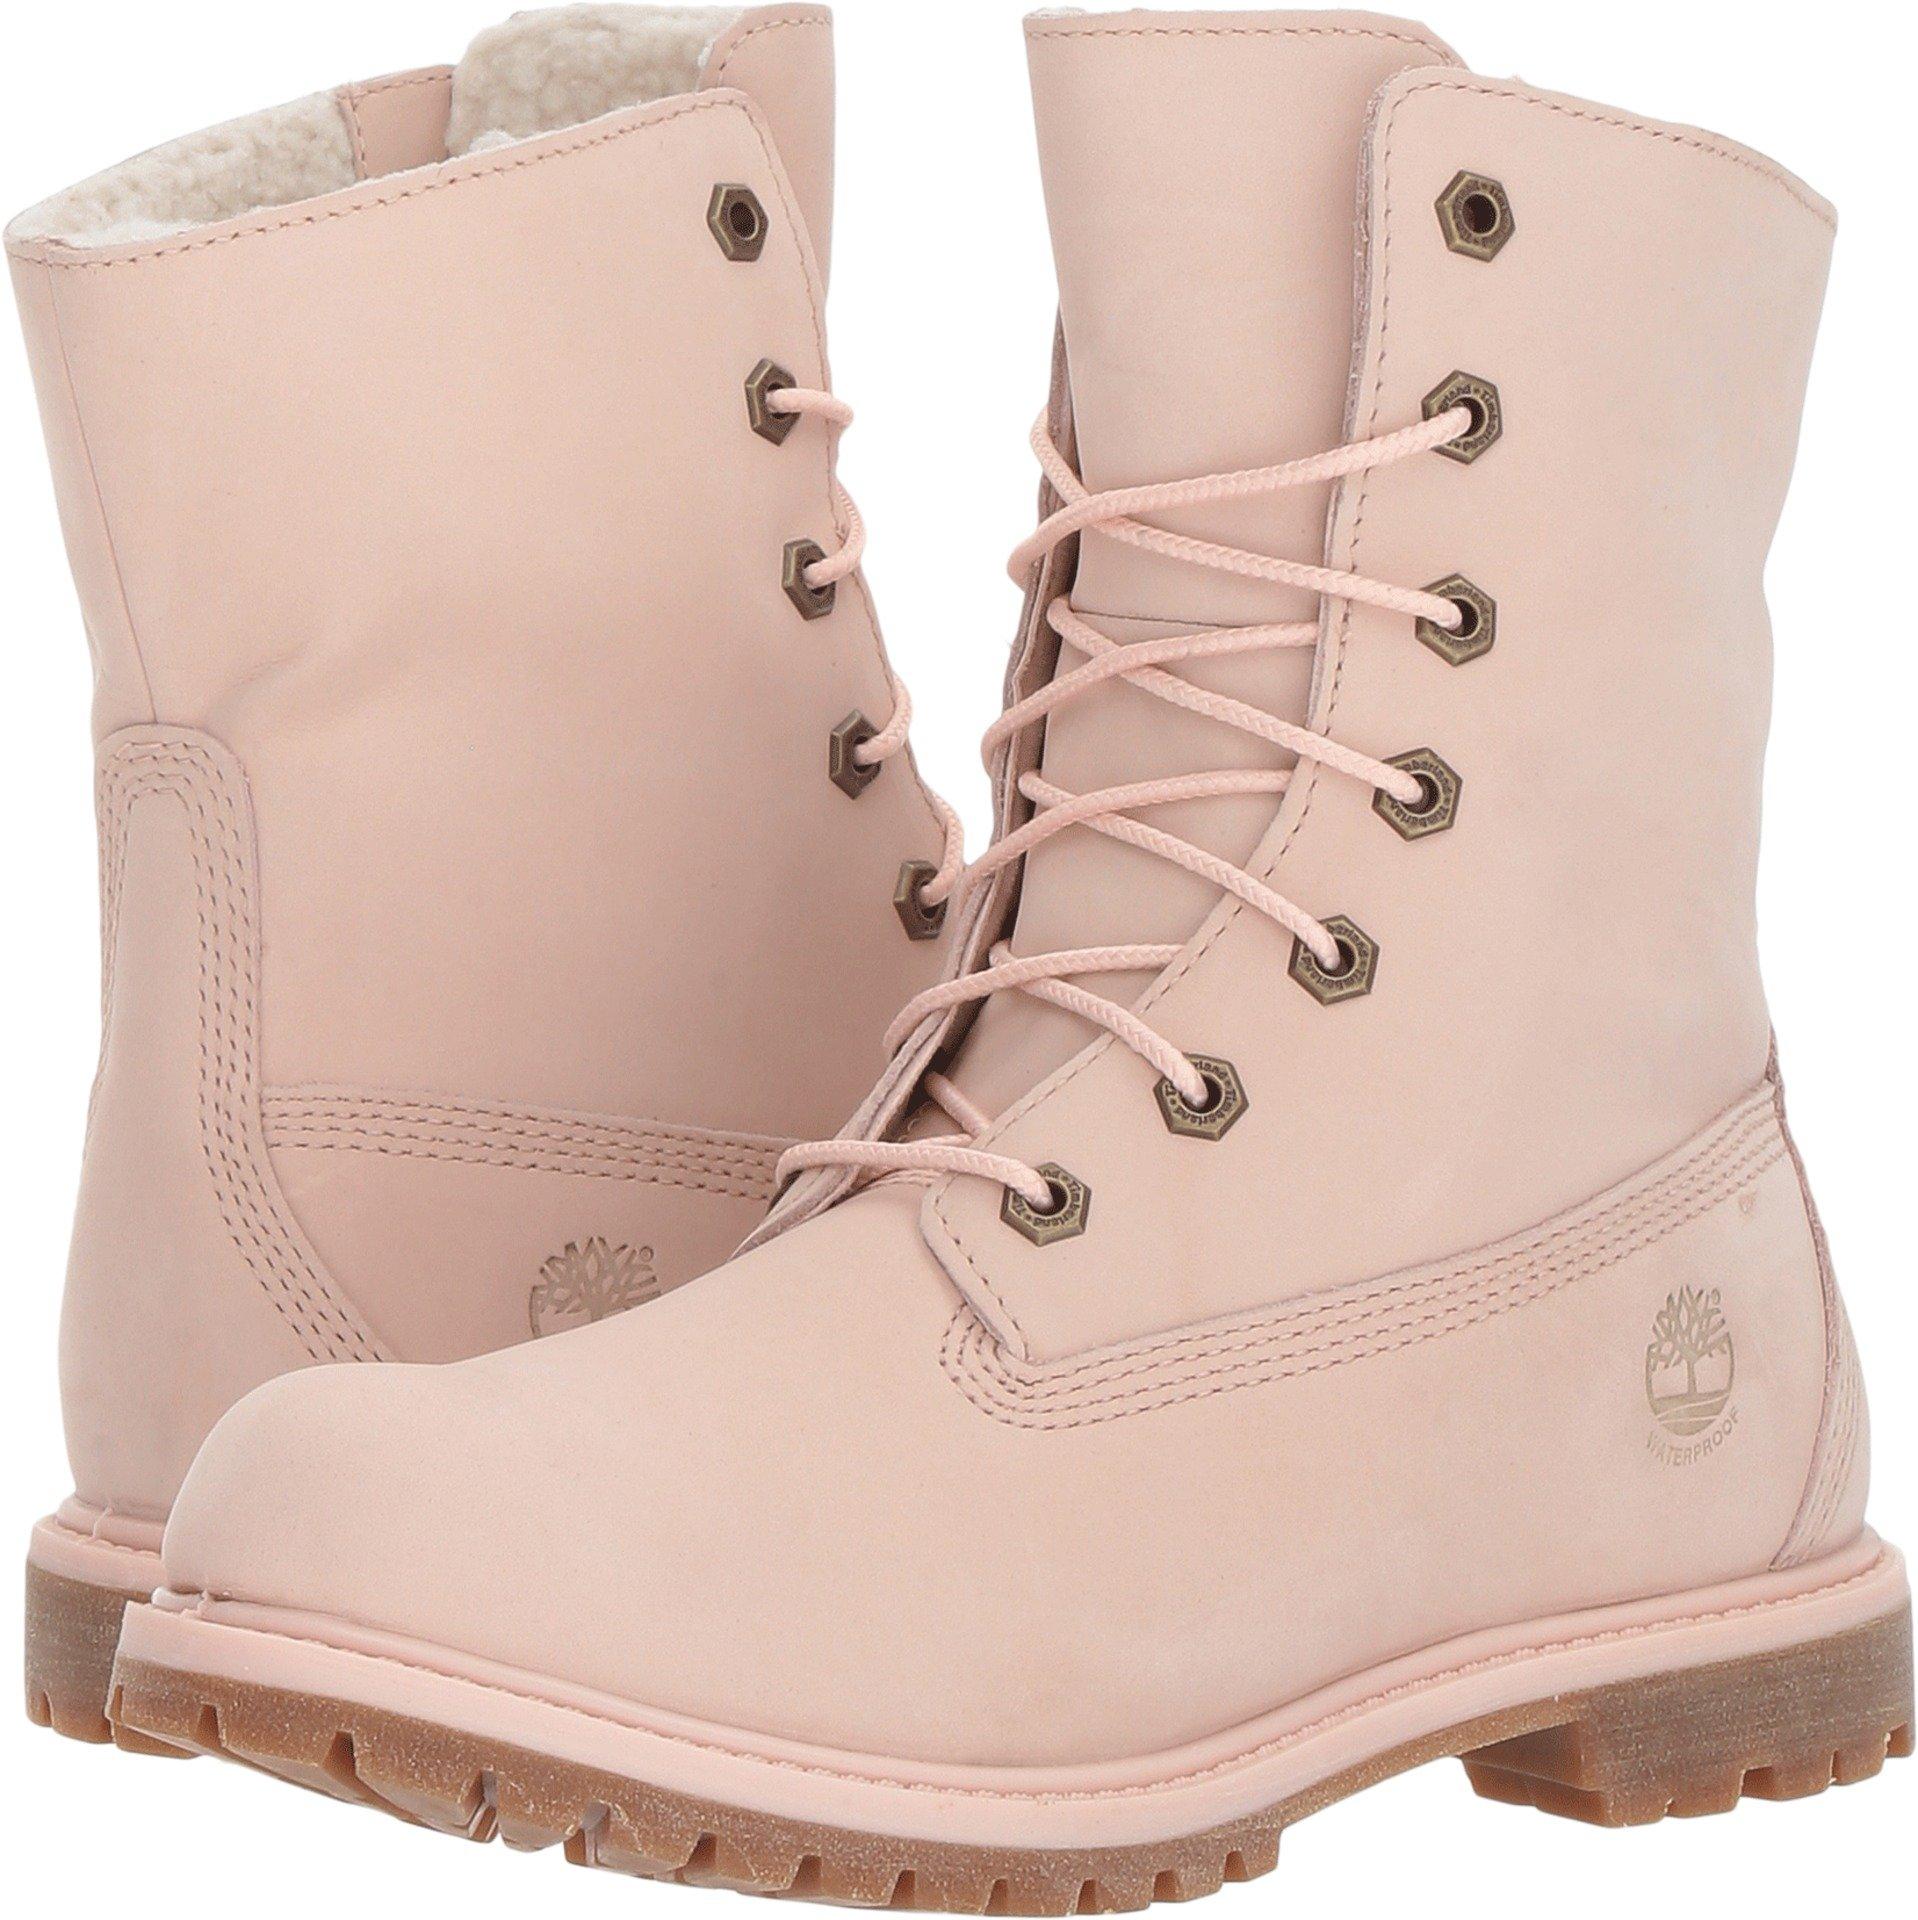 Timberland Authentics Teddy Fleece Waterproof Fold-Down Boot Light Pink Nubuck (Womens) (8.5 B(M) US)